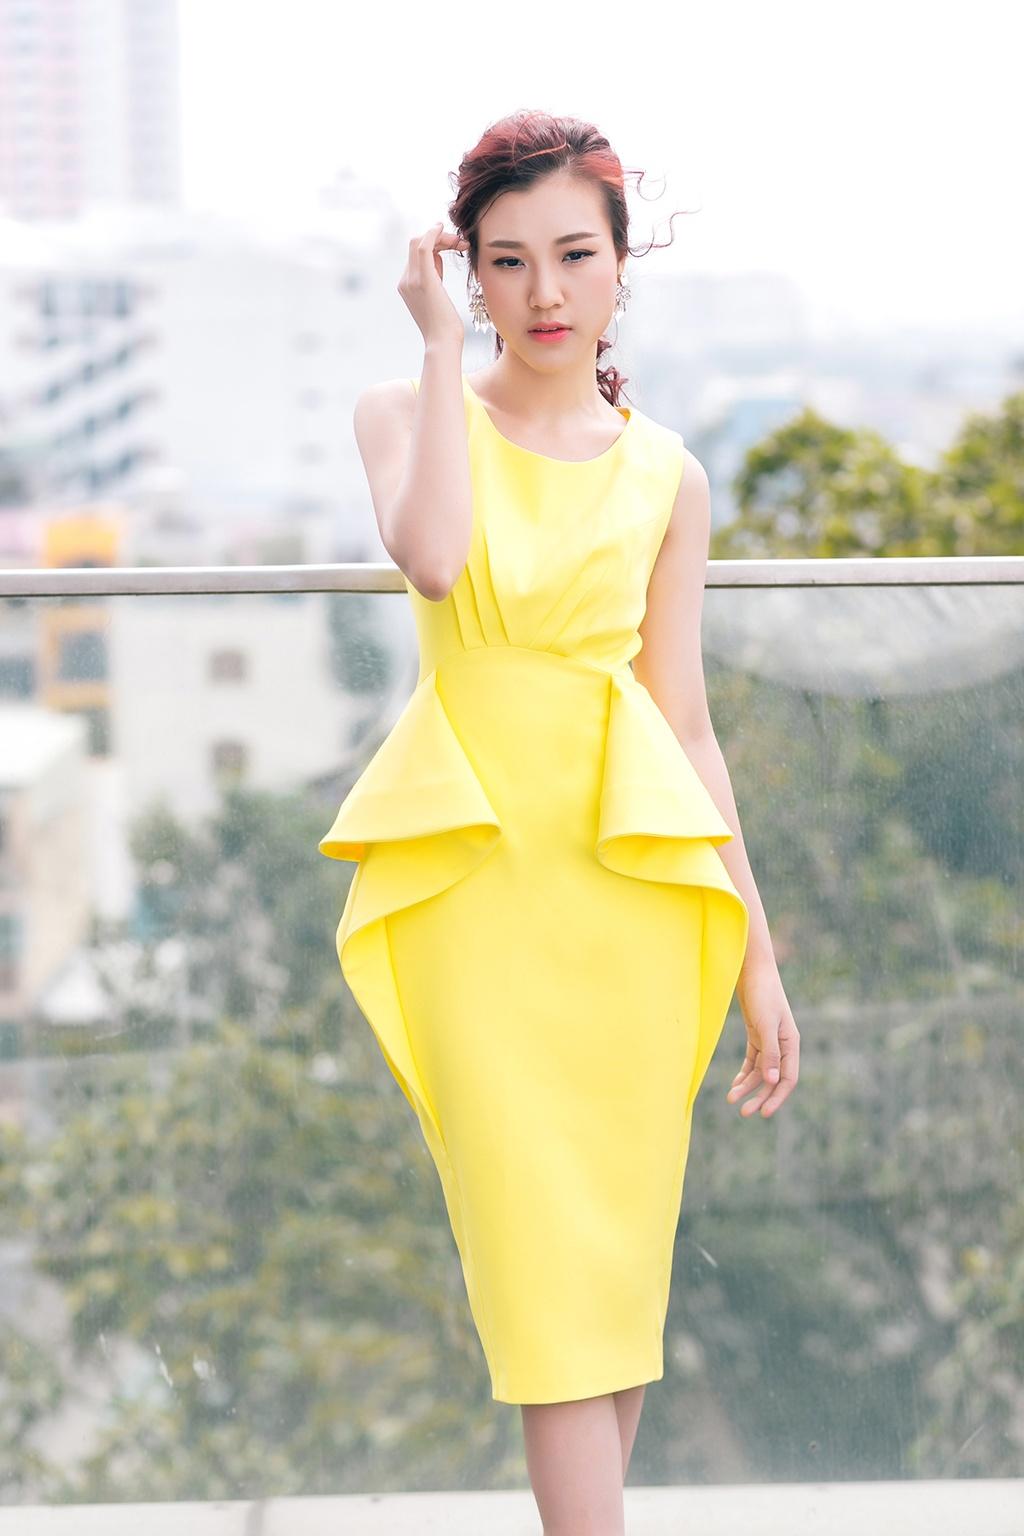 A hau Hoang Oanh mac dep voi 9 set do thanh lich hinh anh 1